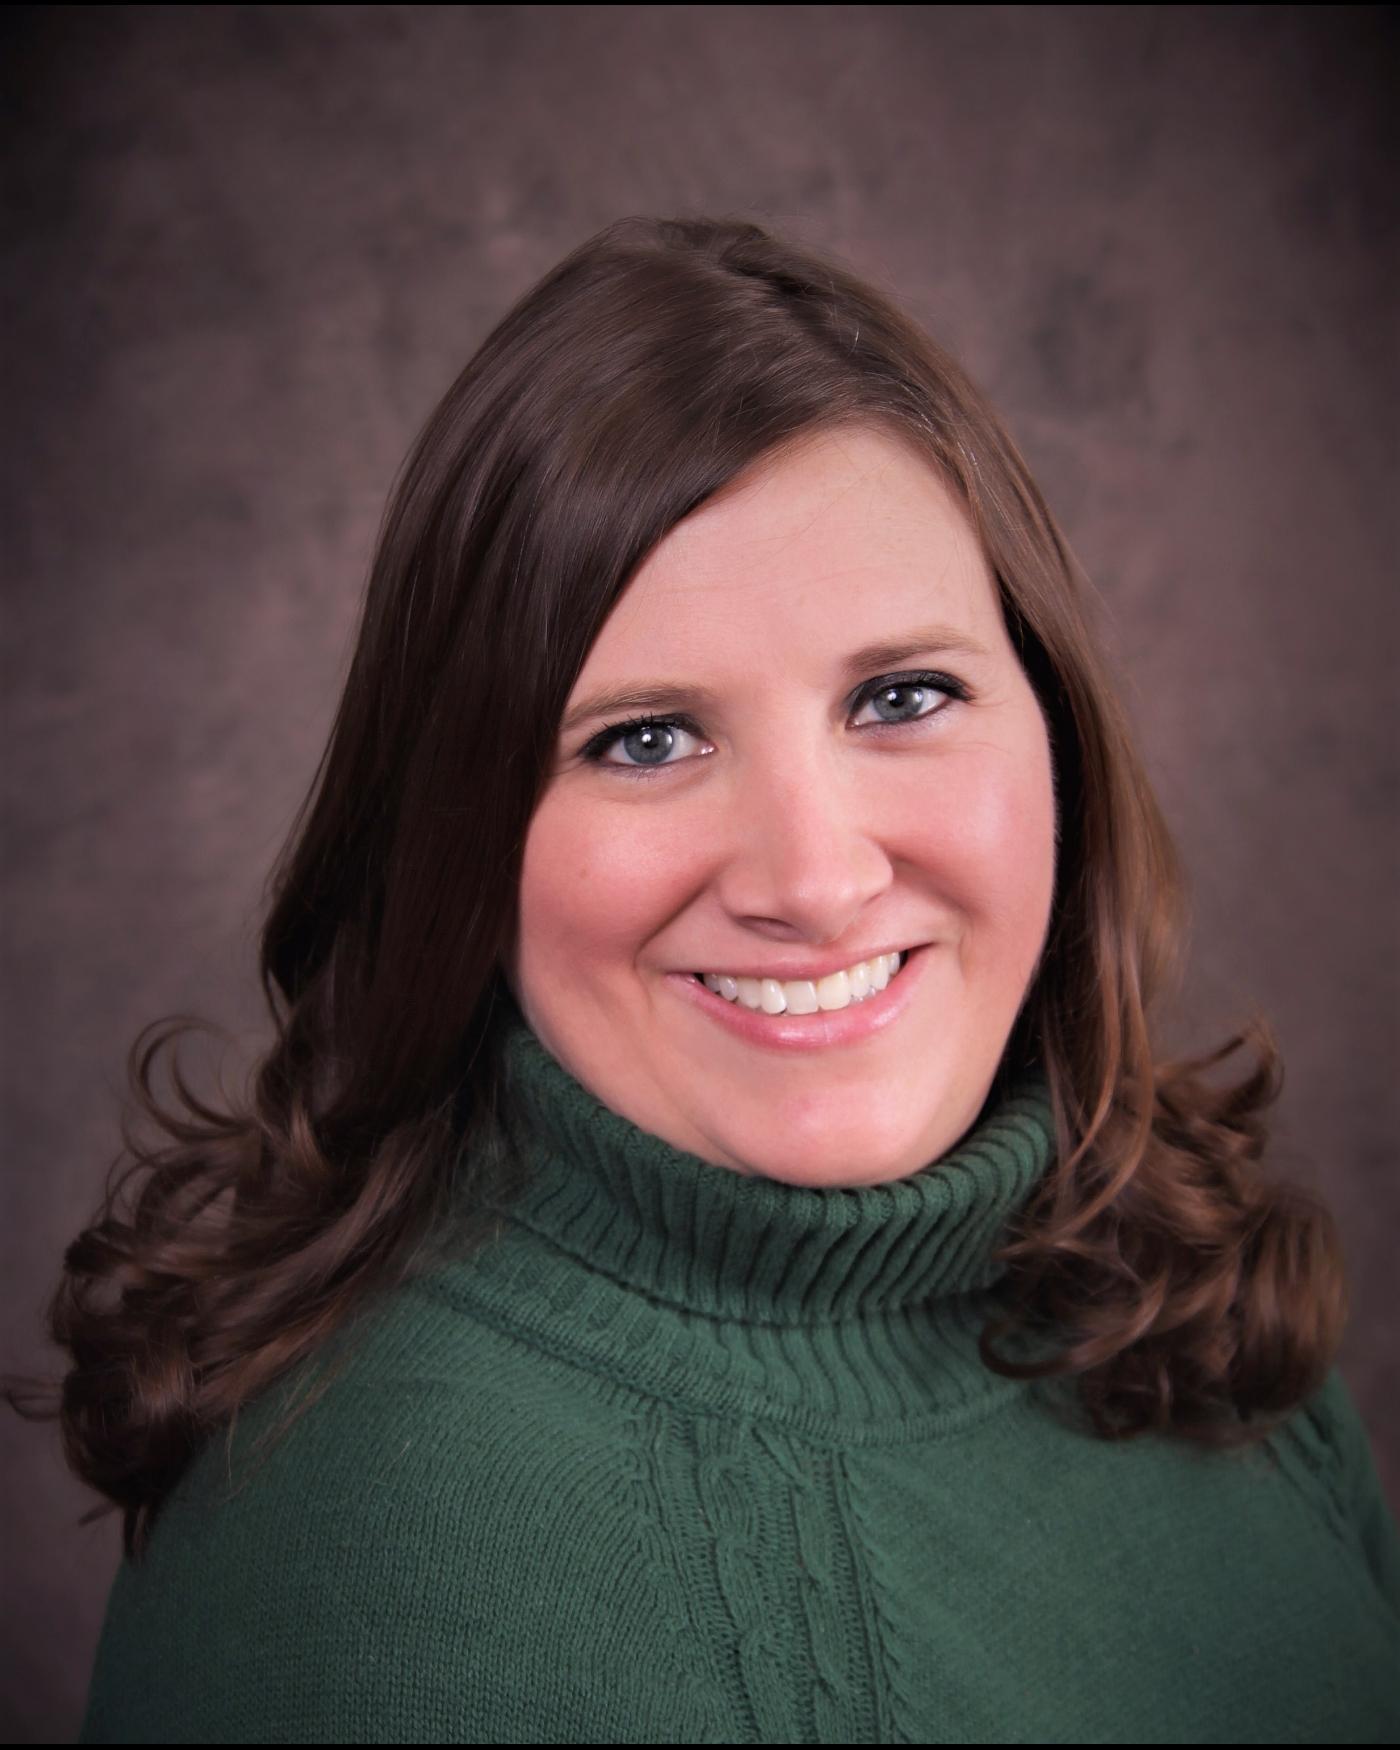 Kristin Treadway